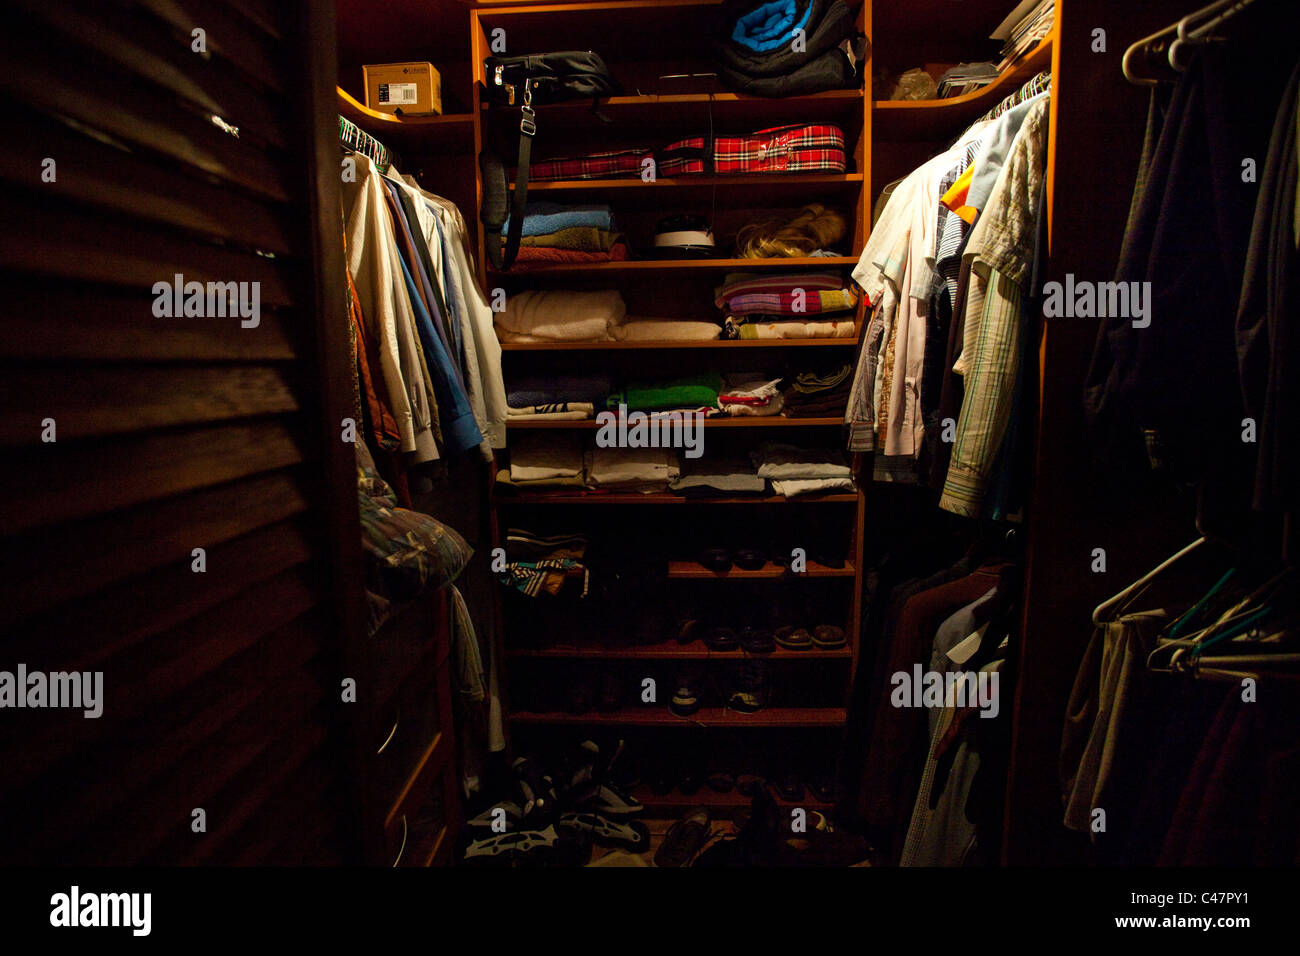 Walk-in closet - Stock Image